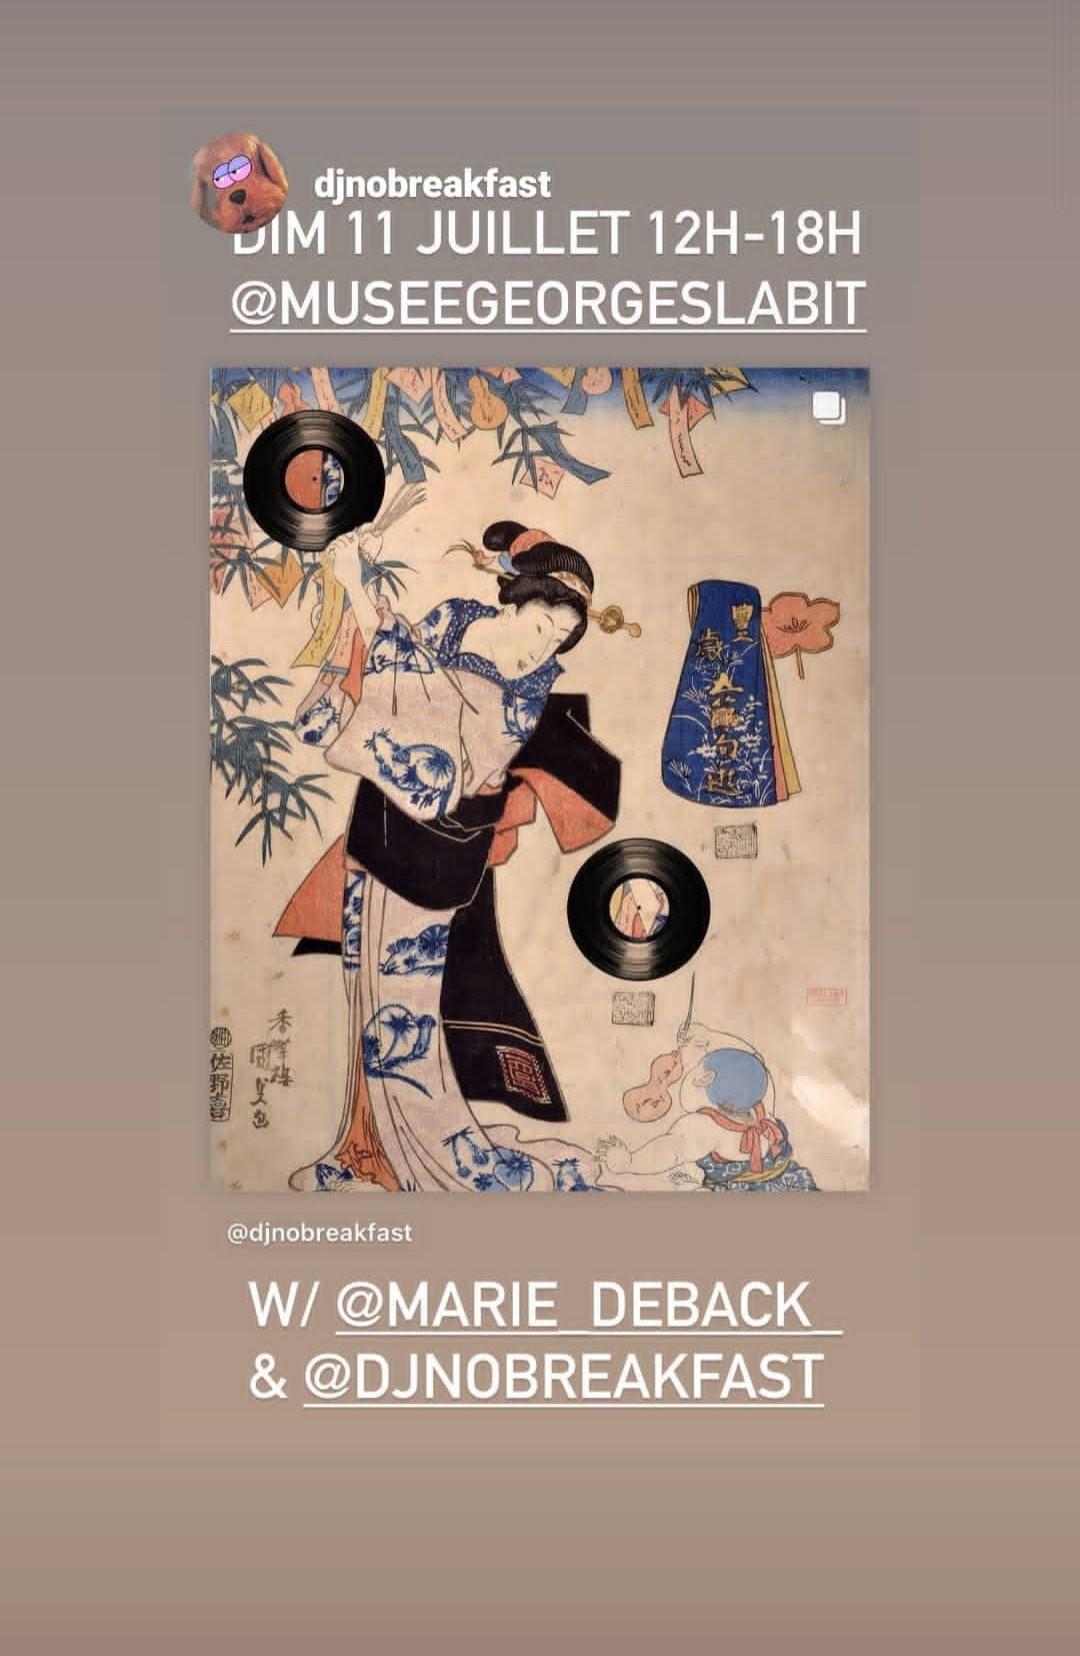 TANABATA w/ Marie Deback & DJ No Breakfast @ Musée G. Labit